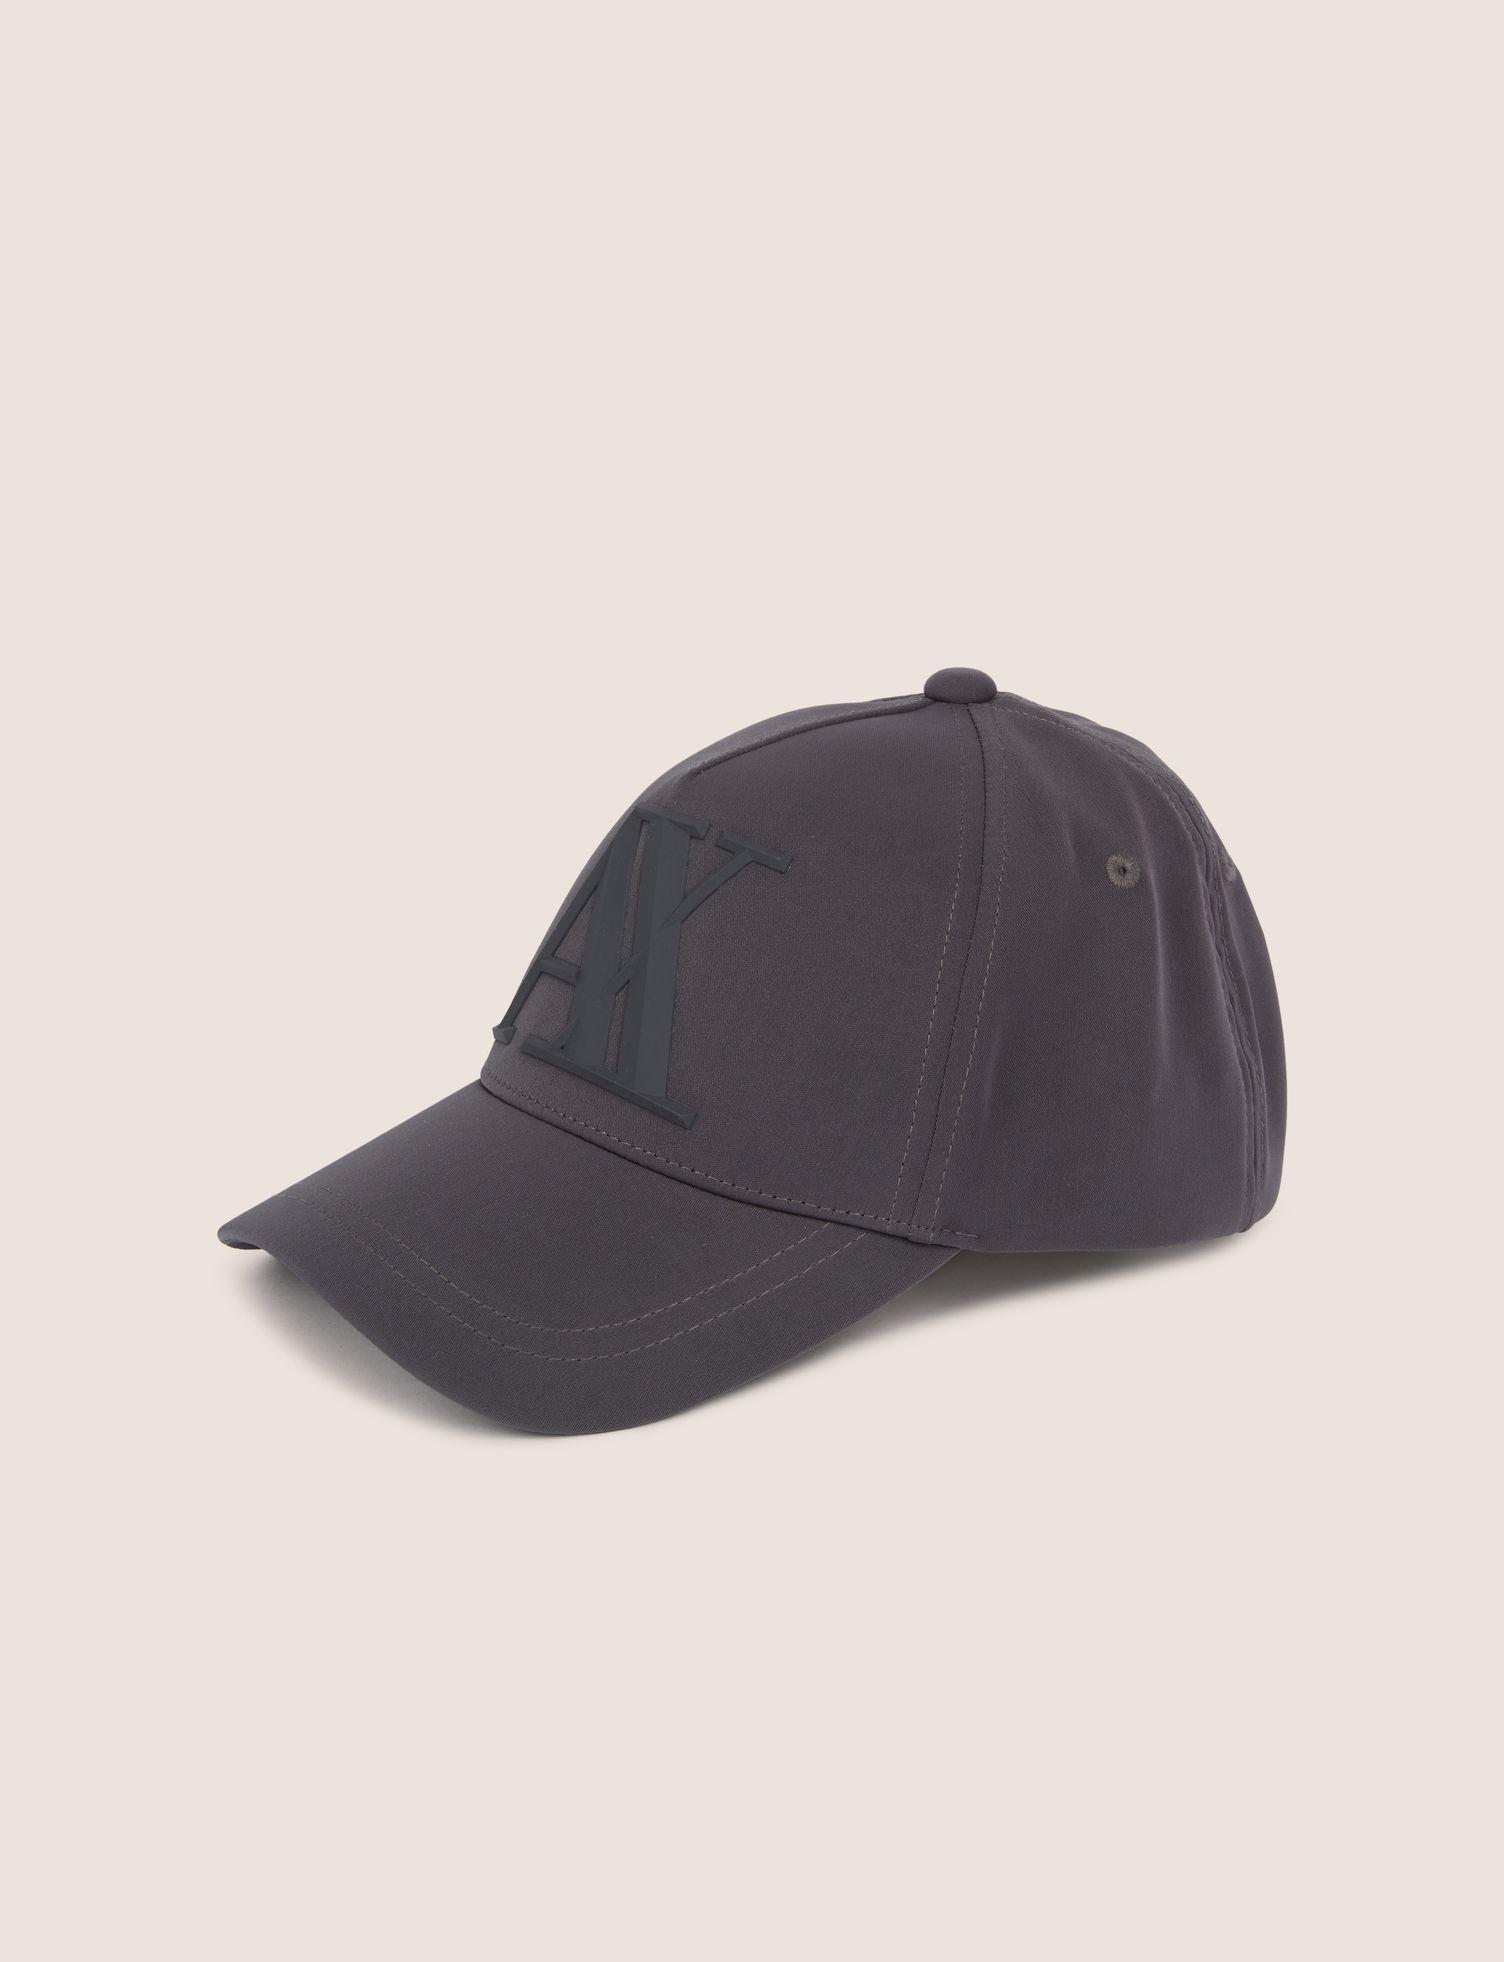 3e32c6c5 Lyst - Armani Exchange Rubber Logo Hat in Gray for Men